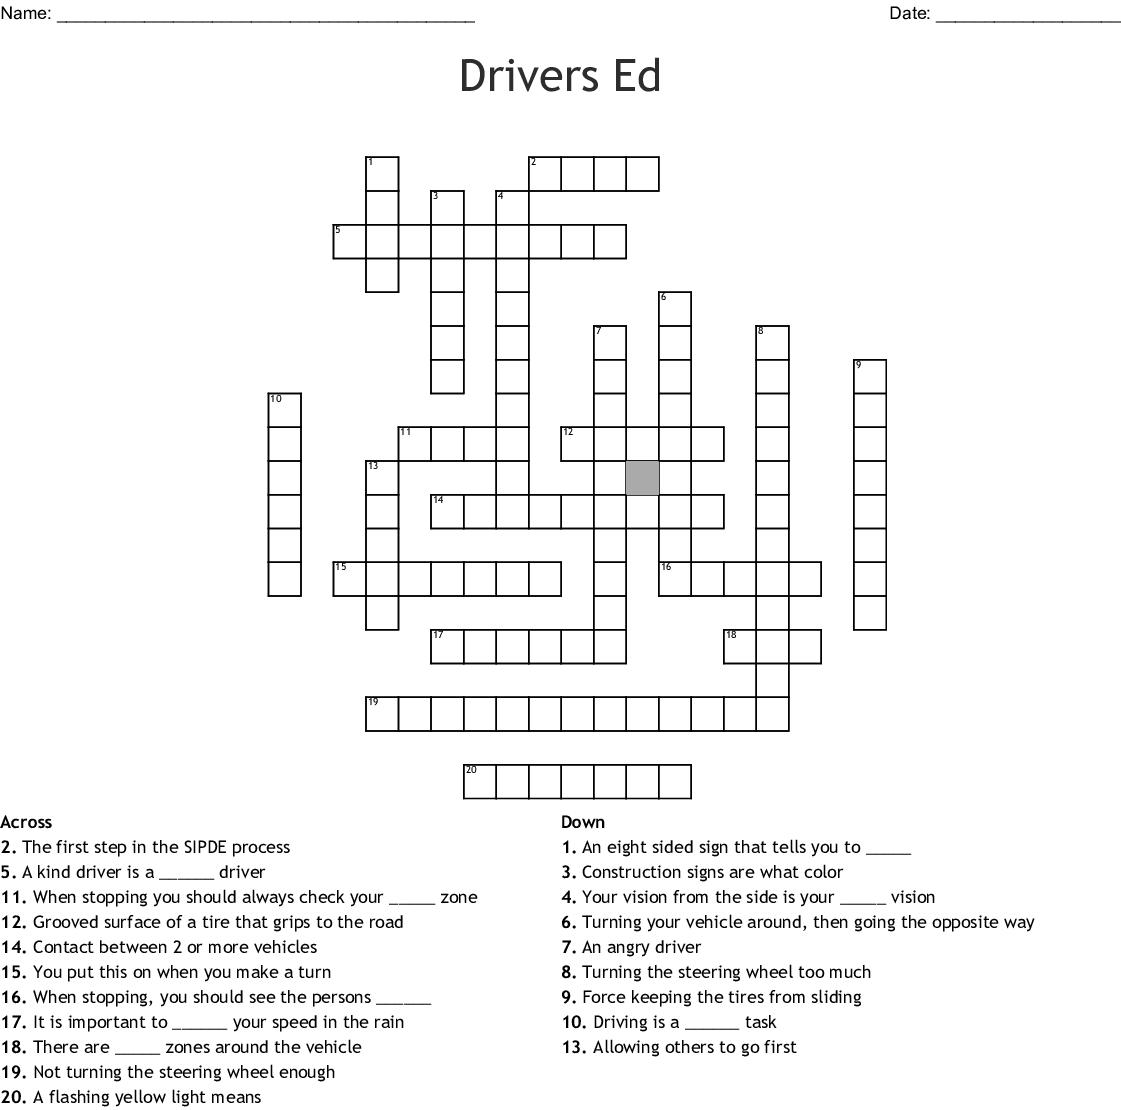 Drivers Ed Crossword